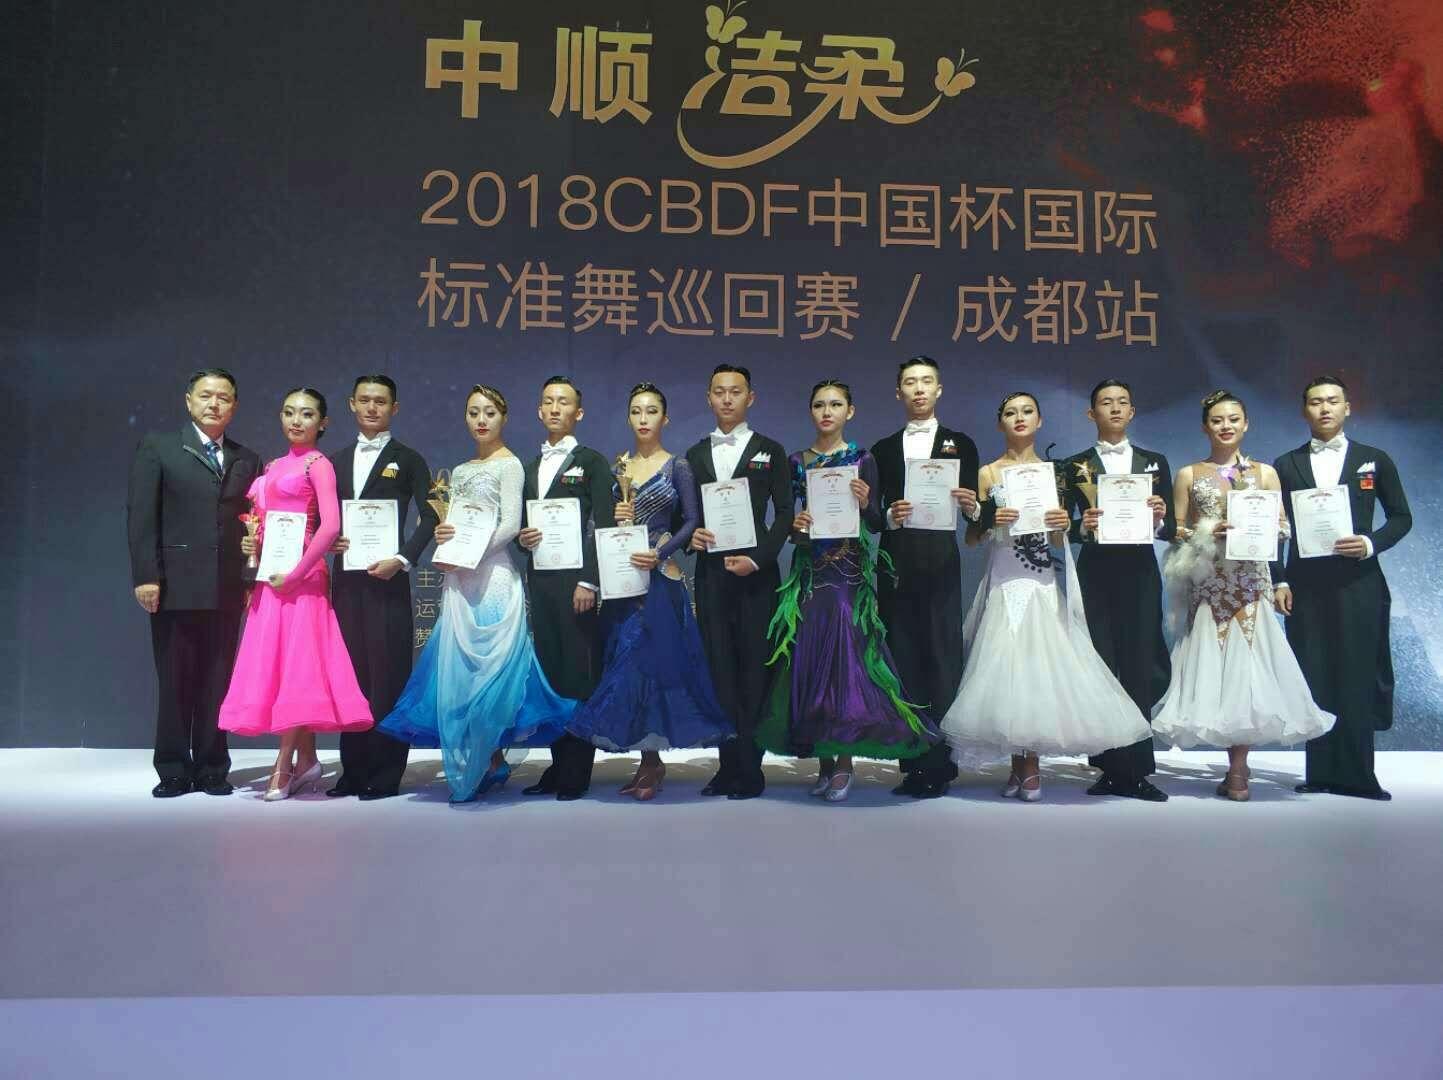 2018CBDF中国杯国际标准舞巡回赛